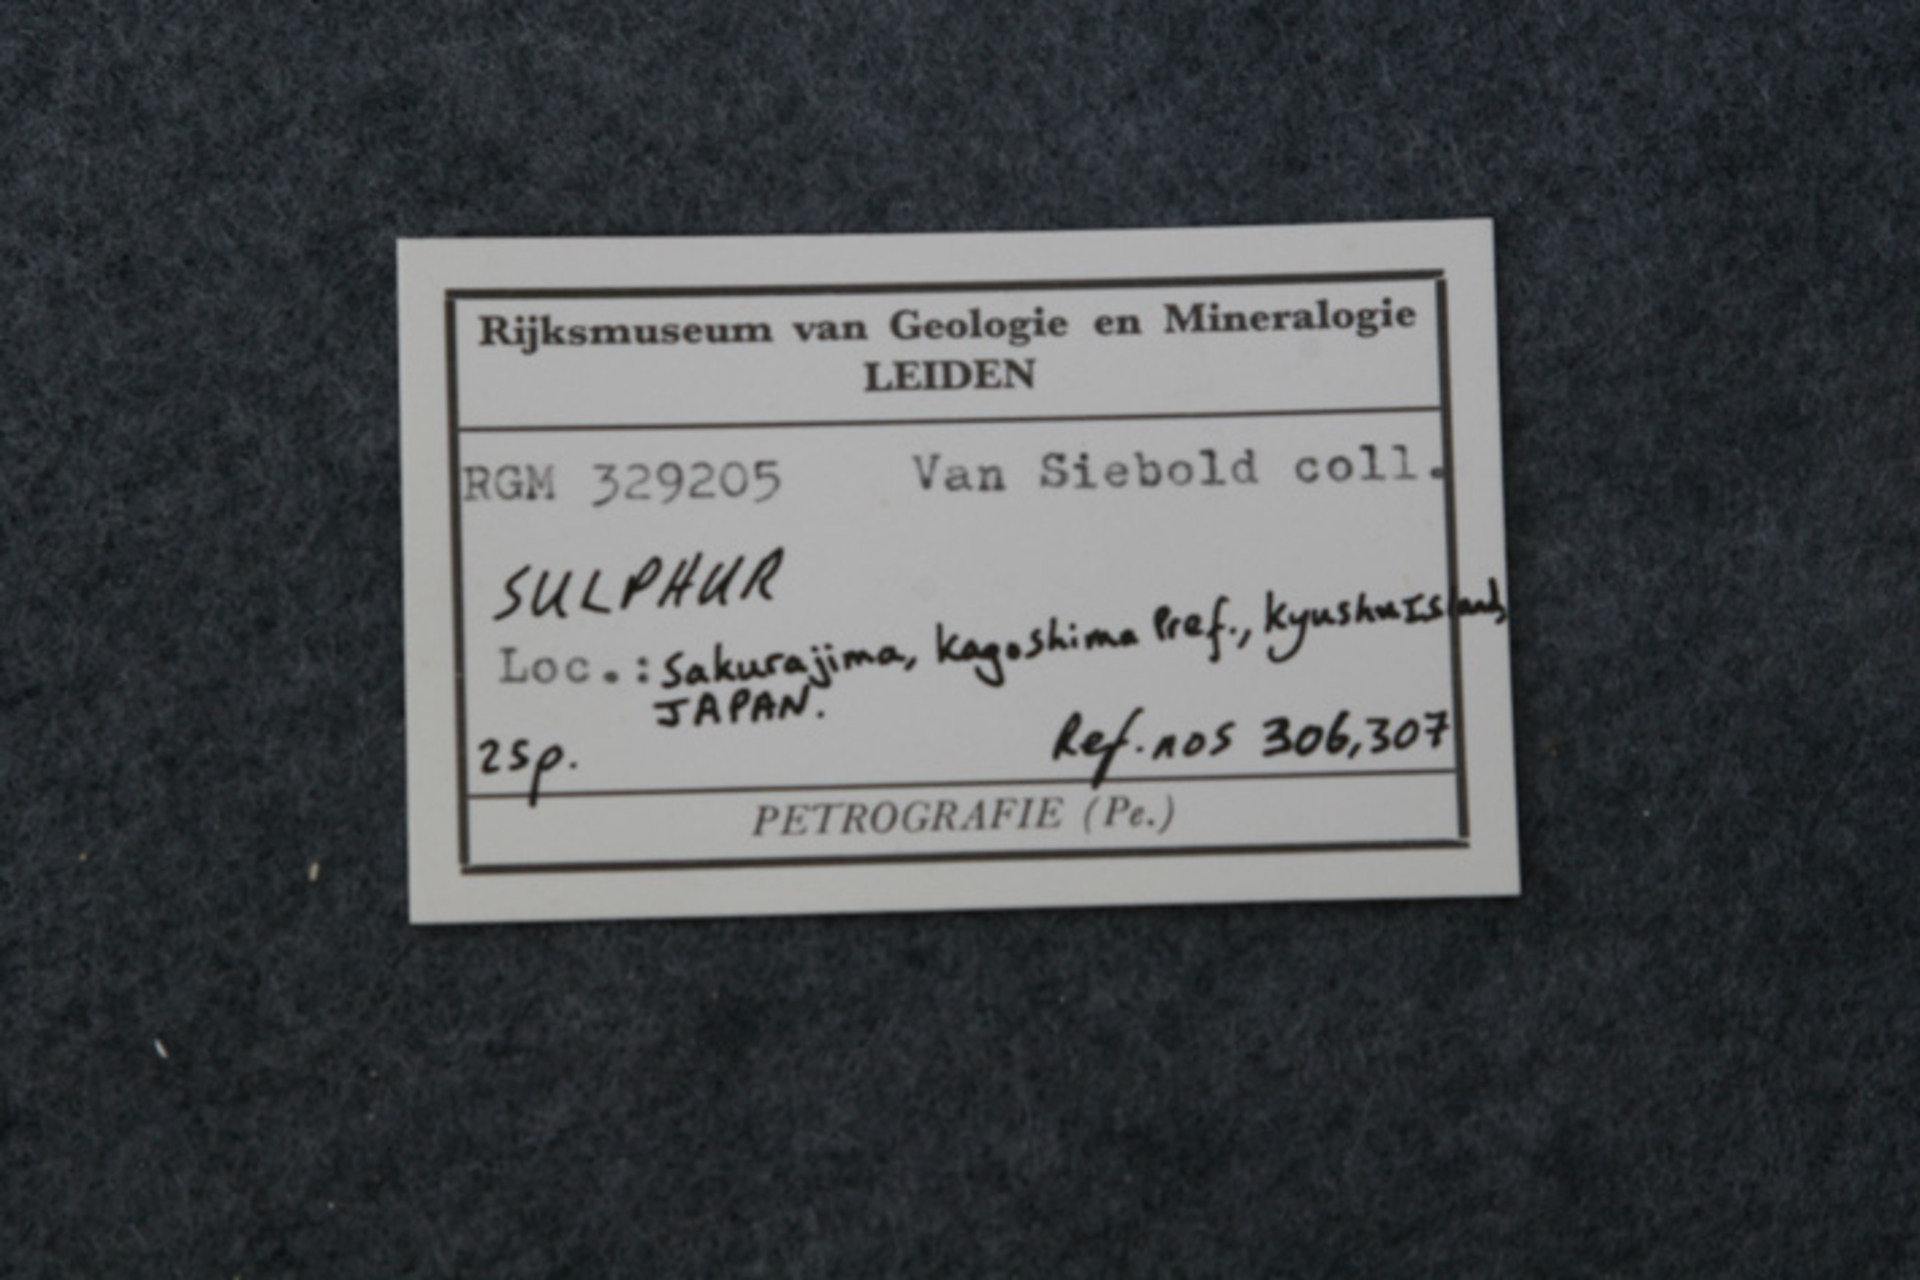 RGM.329205 | SULPHUR